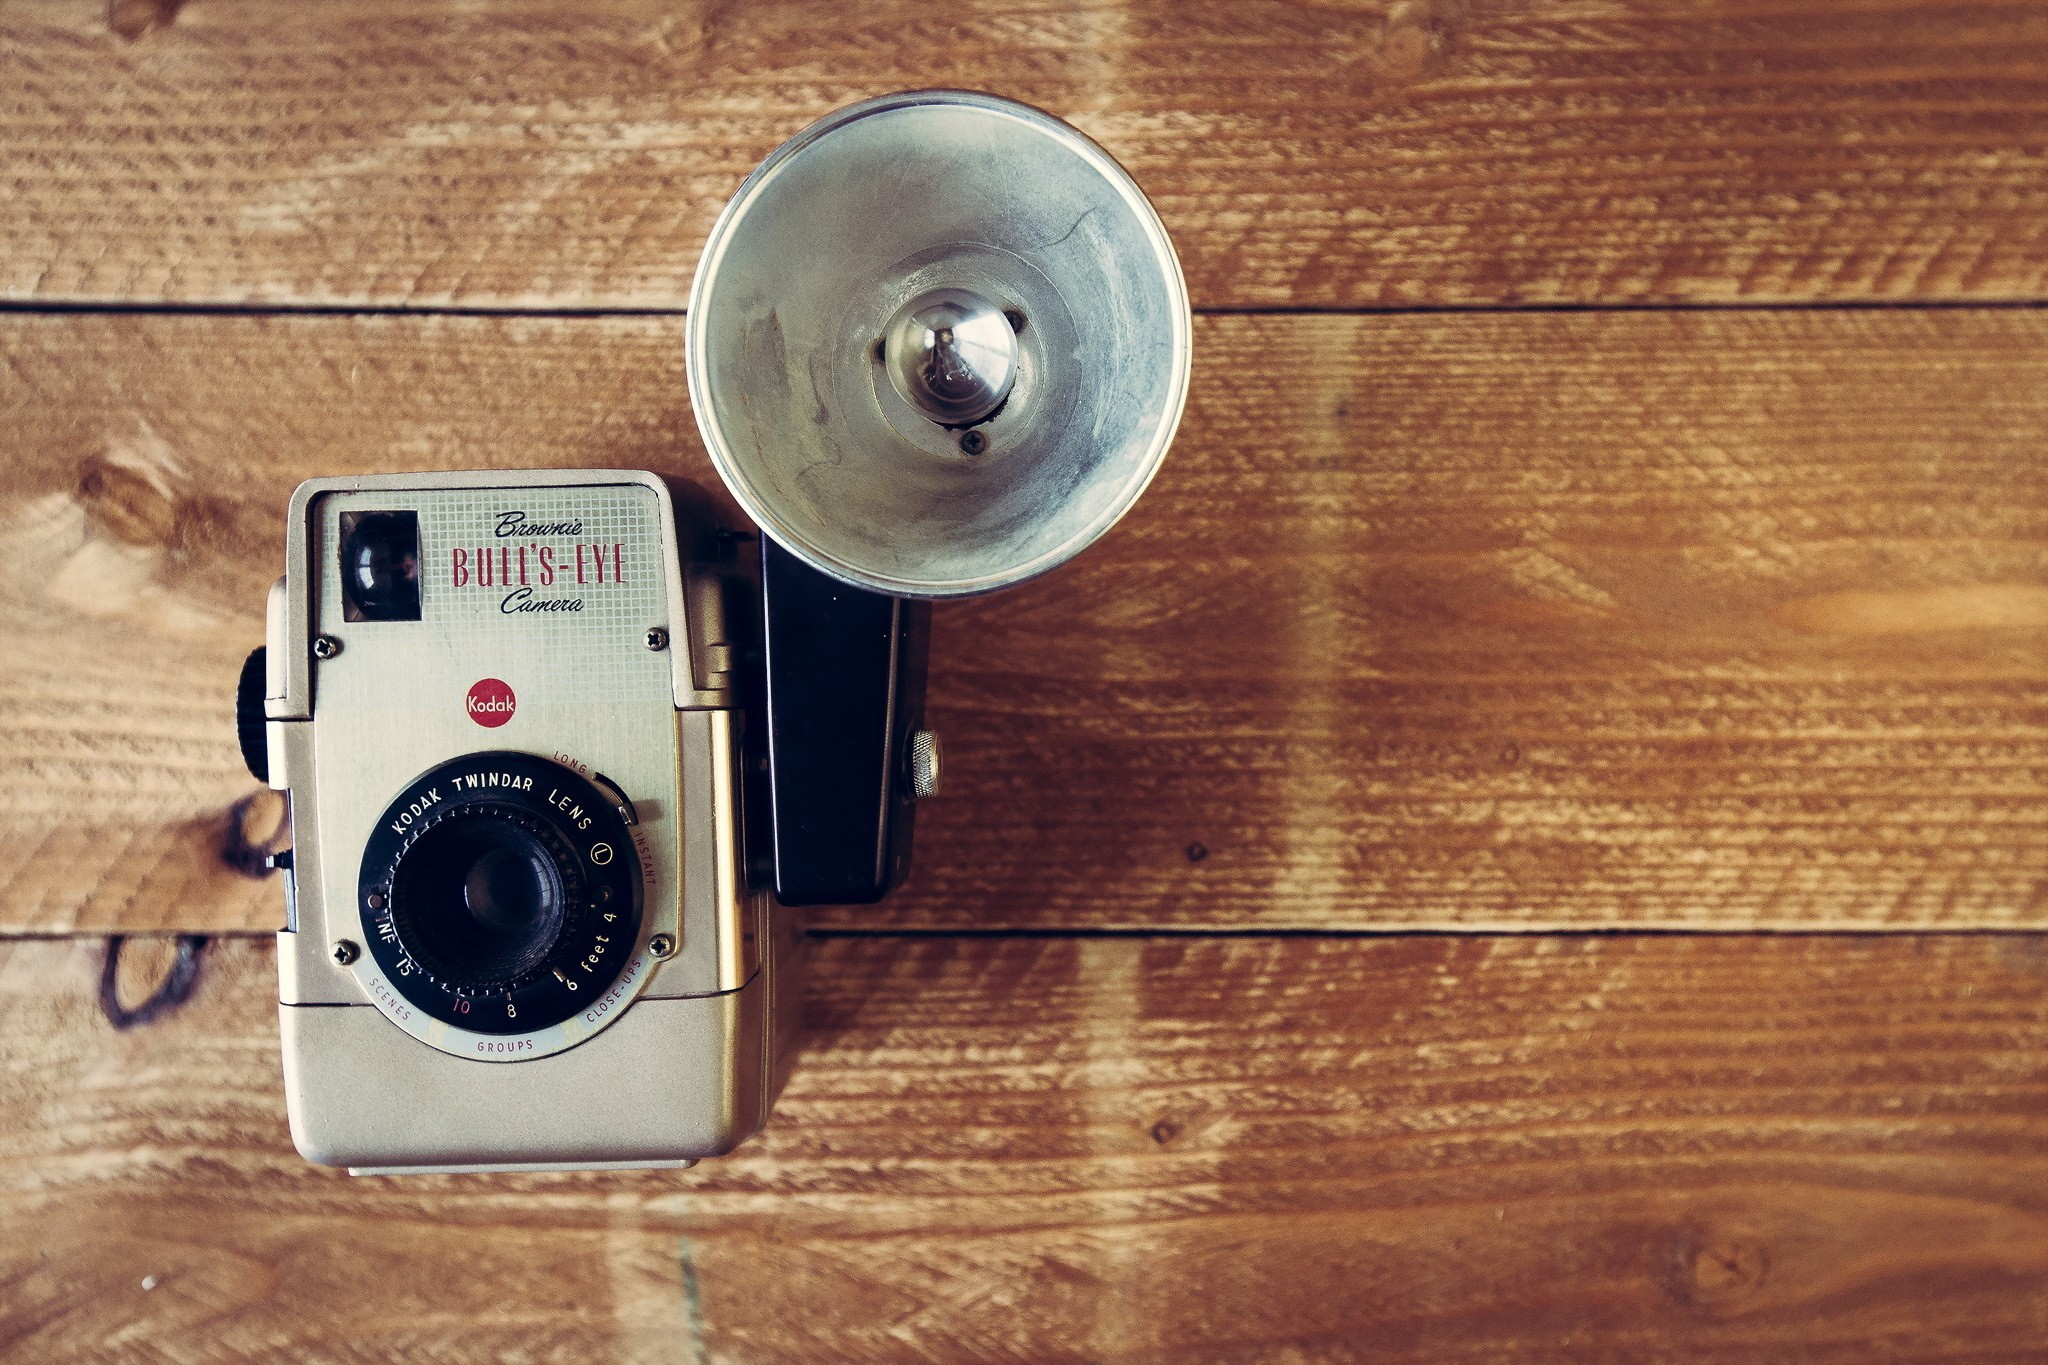 1600x900 Camera Vintage 1600x900 Resolution HD 4k ...